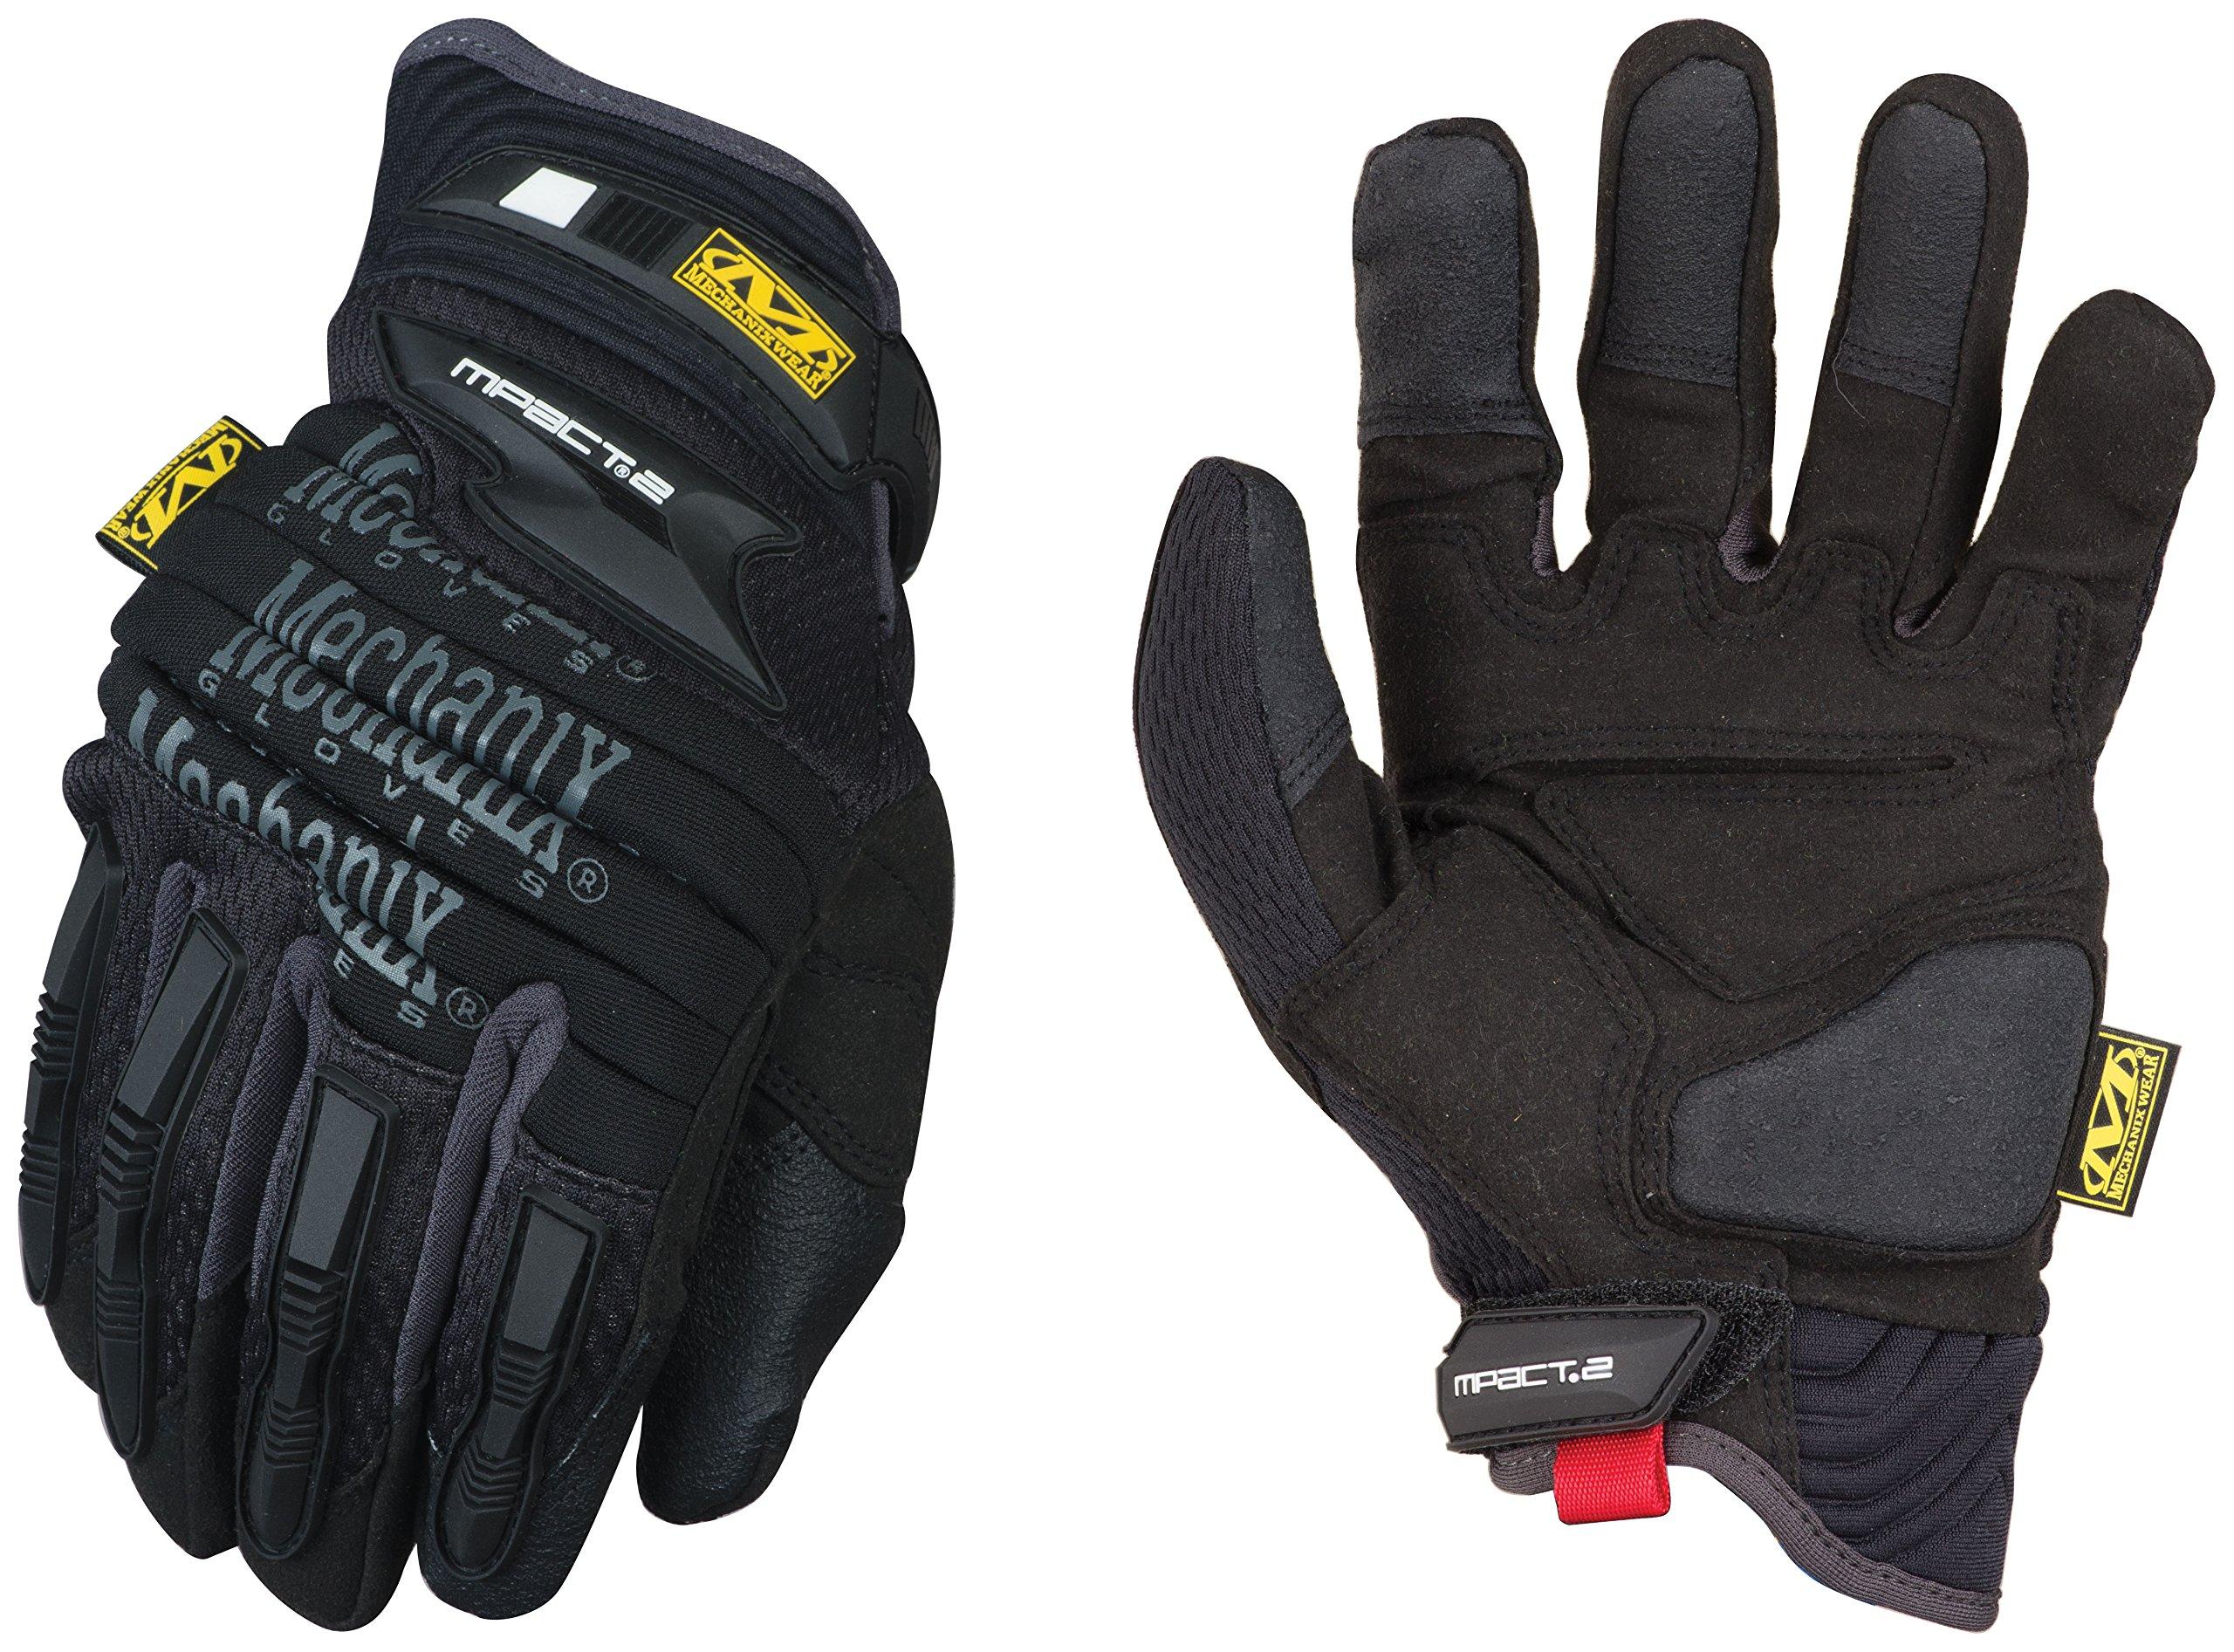 Mechanix Wear - M-Pact 2 Work Gloves (Medium, Black)